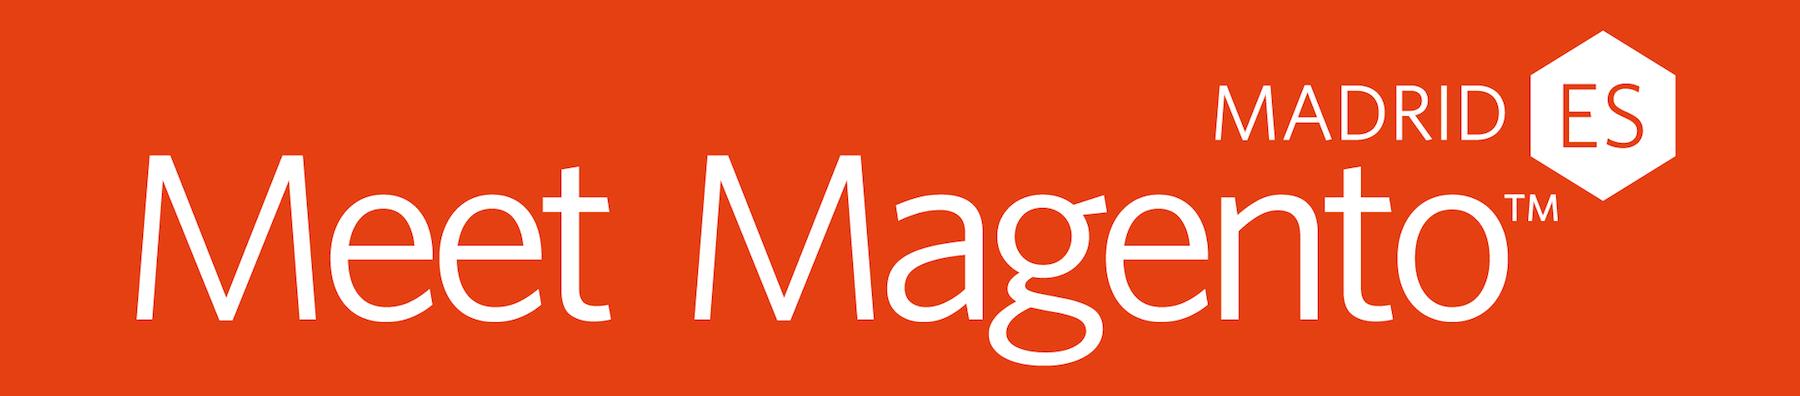 Meet magento Spain 2017